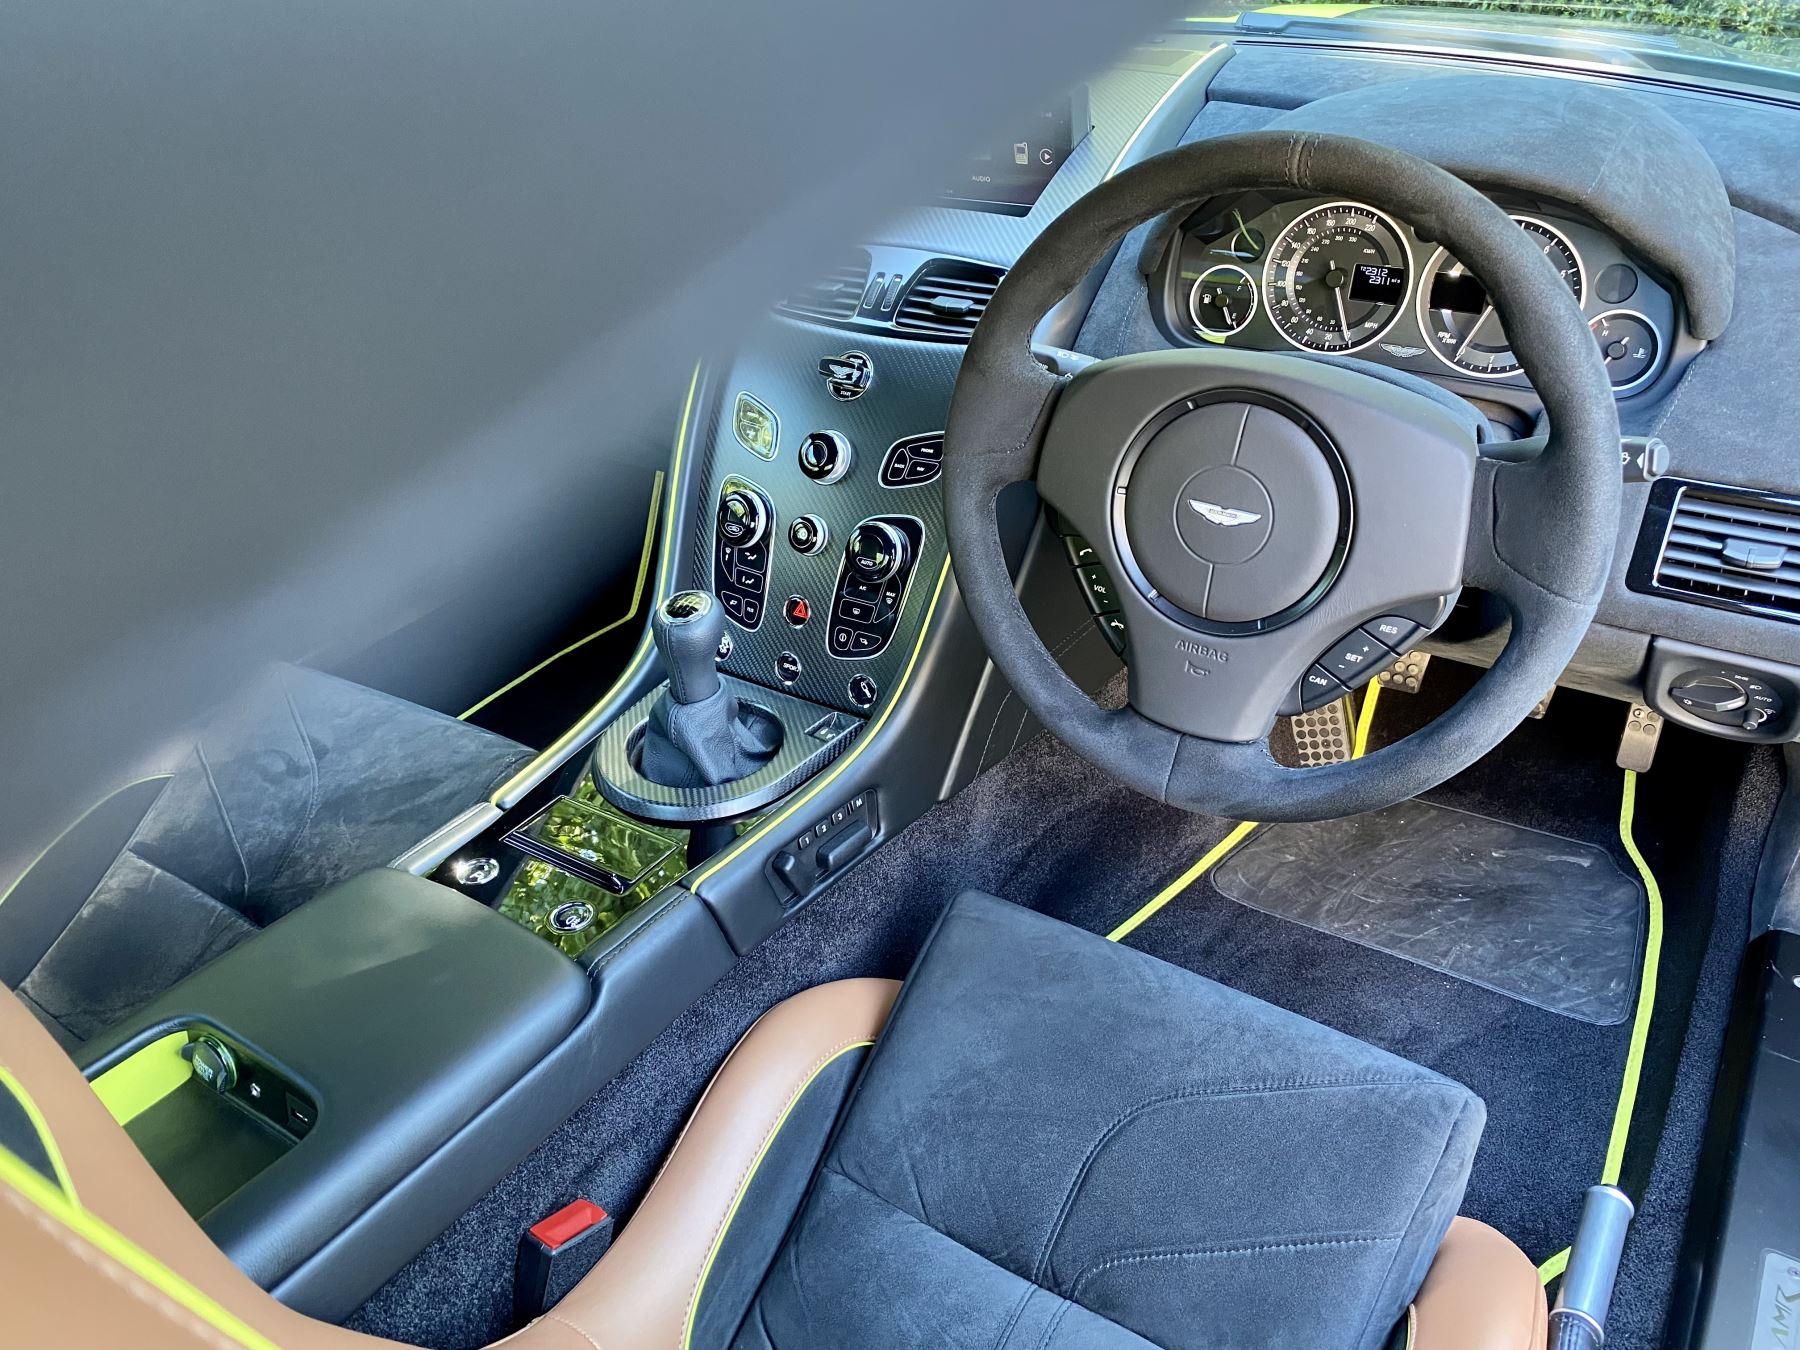 Aston Martin V12 Vantage AMR 6.0 V12 600BHP Manual 1 of 100.     1 Owner From New, Full Aston Martin History. image 21